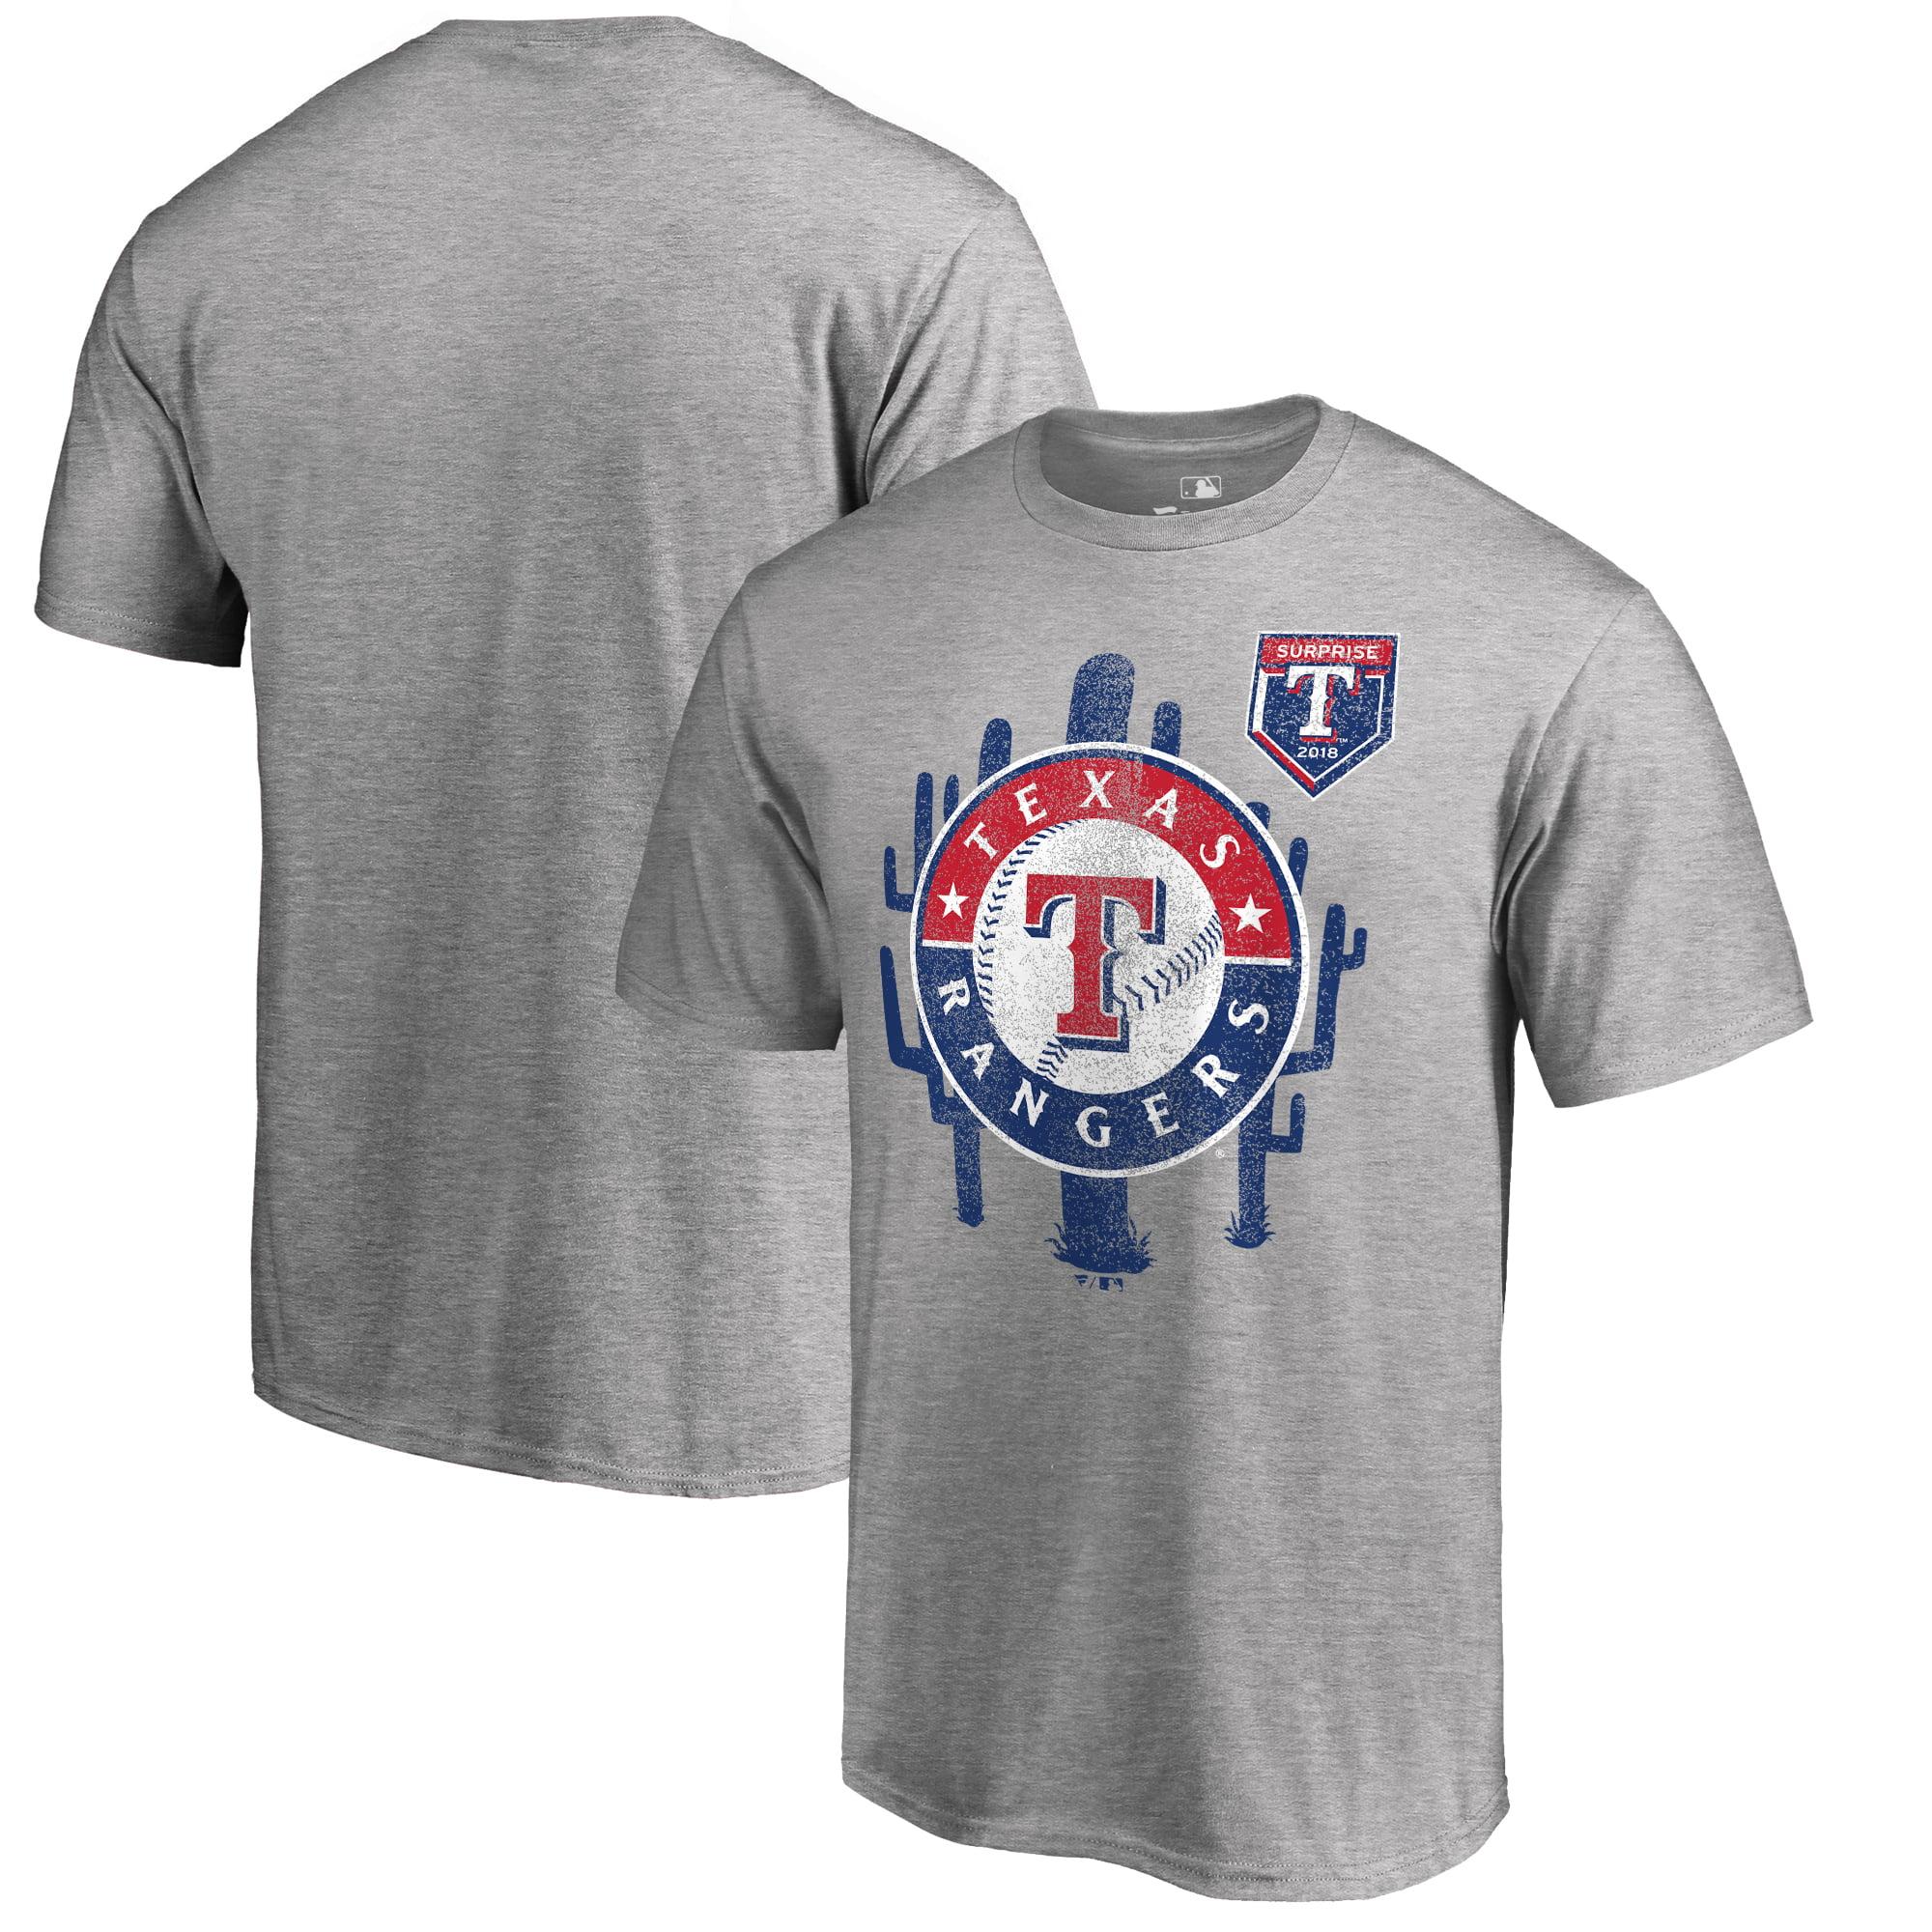 Texas Rangers Fanatics Branded 2018 MLB Spring Training Vintage T-Shirt - Heather Gray